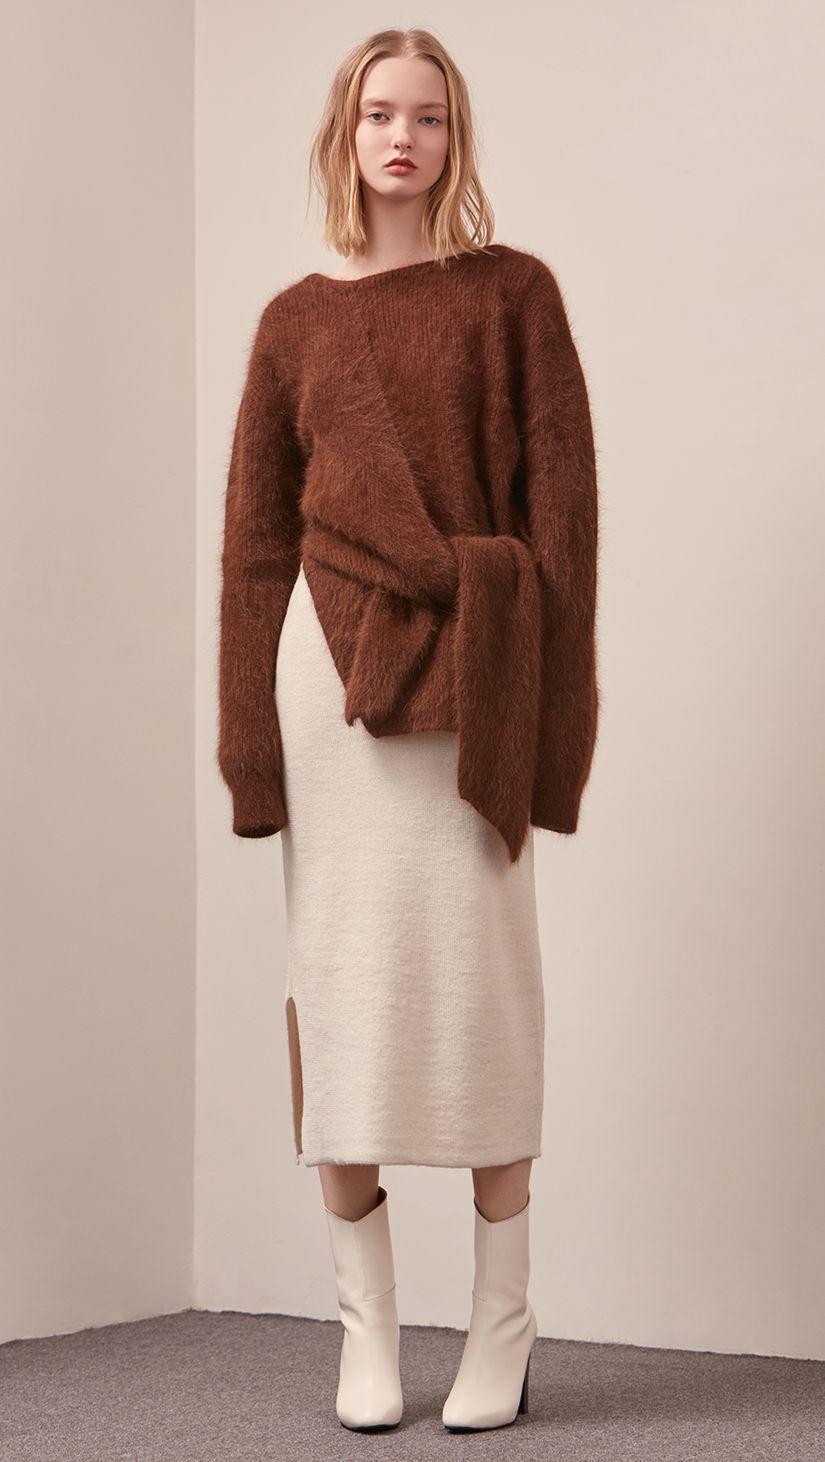 Amuza Sweater | Knit wrap, Wrap style and Alpacas